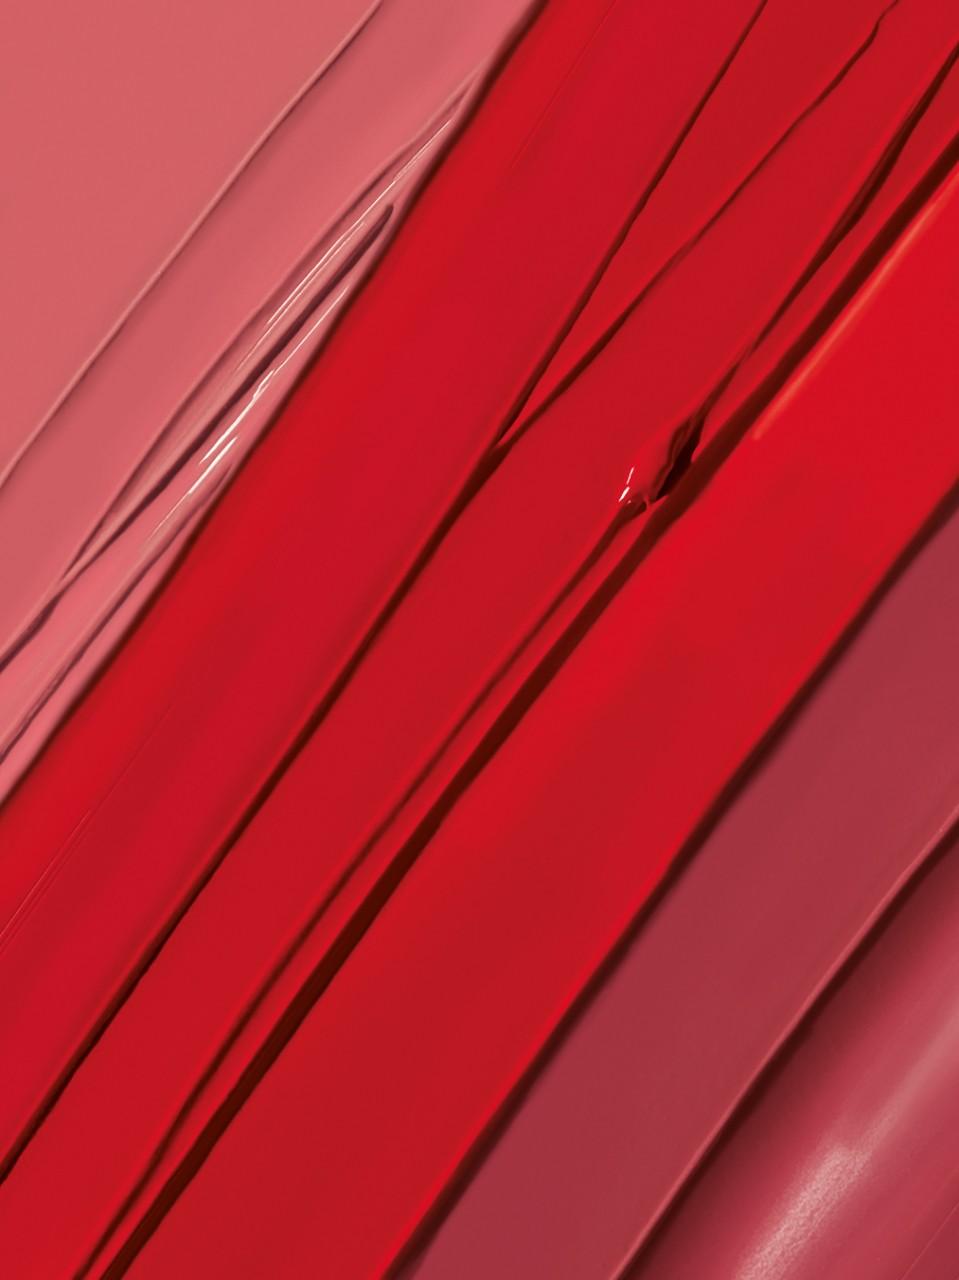 Makeup-texture-pink-red-lipstick-streaks-1222-1280-x-1280